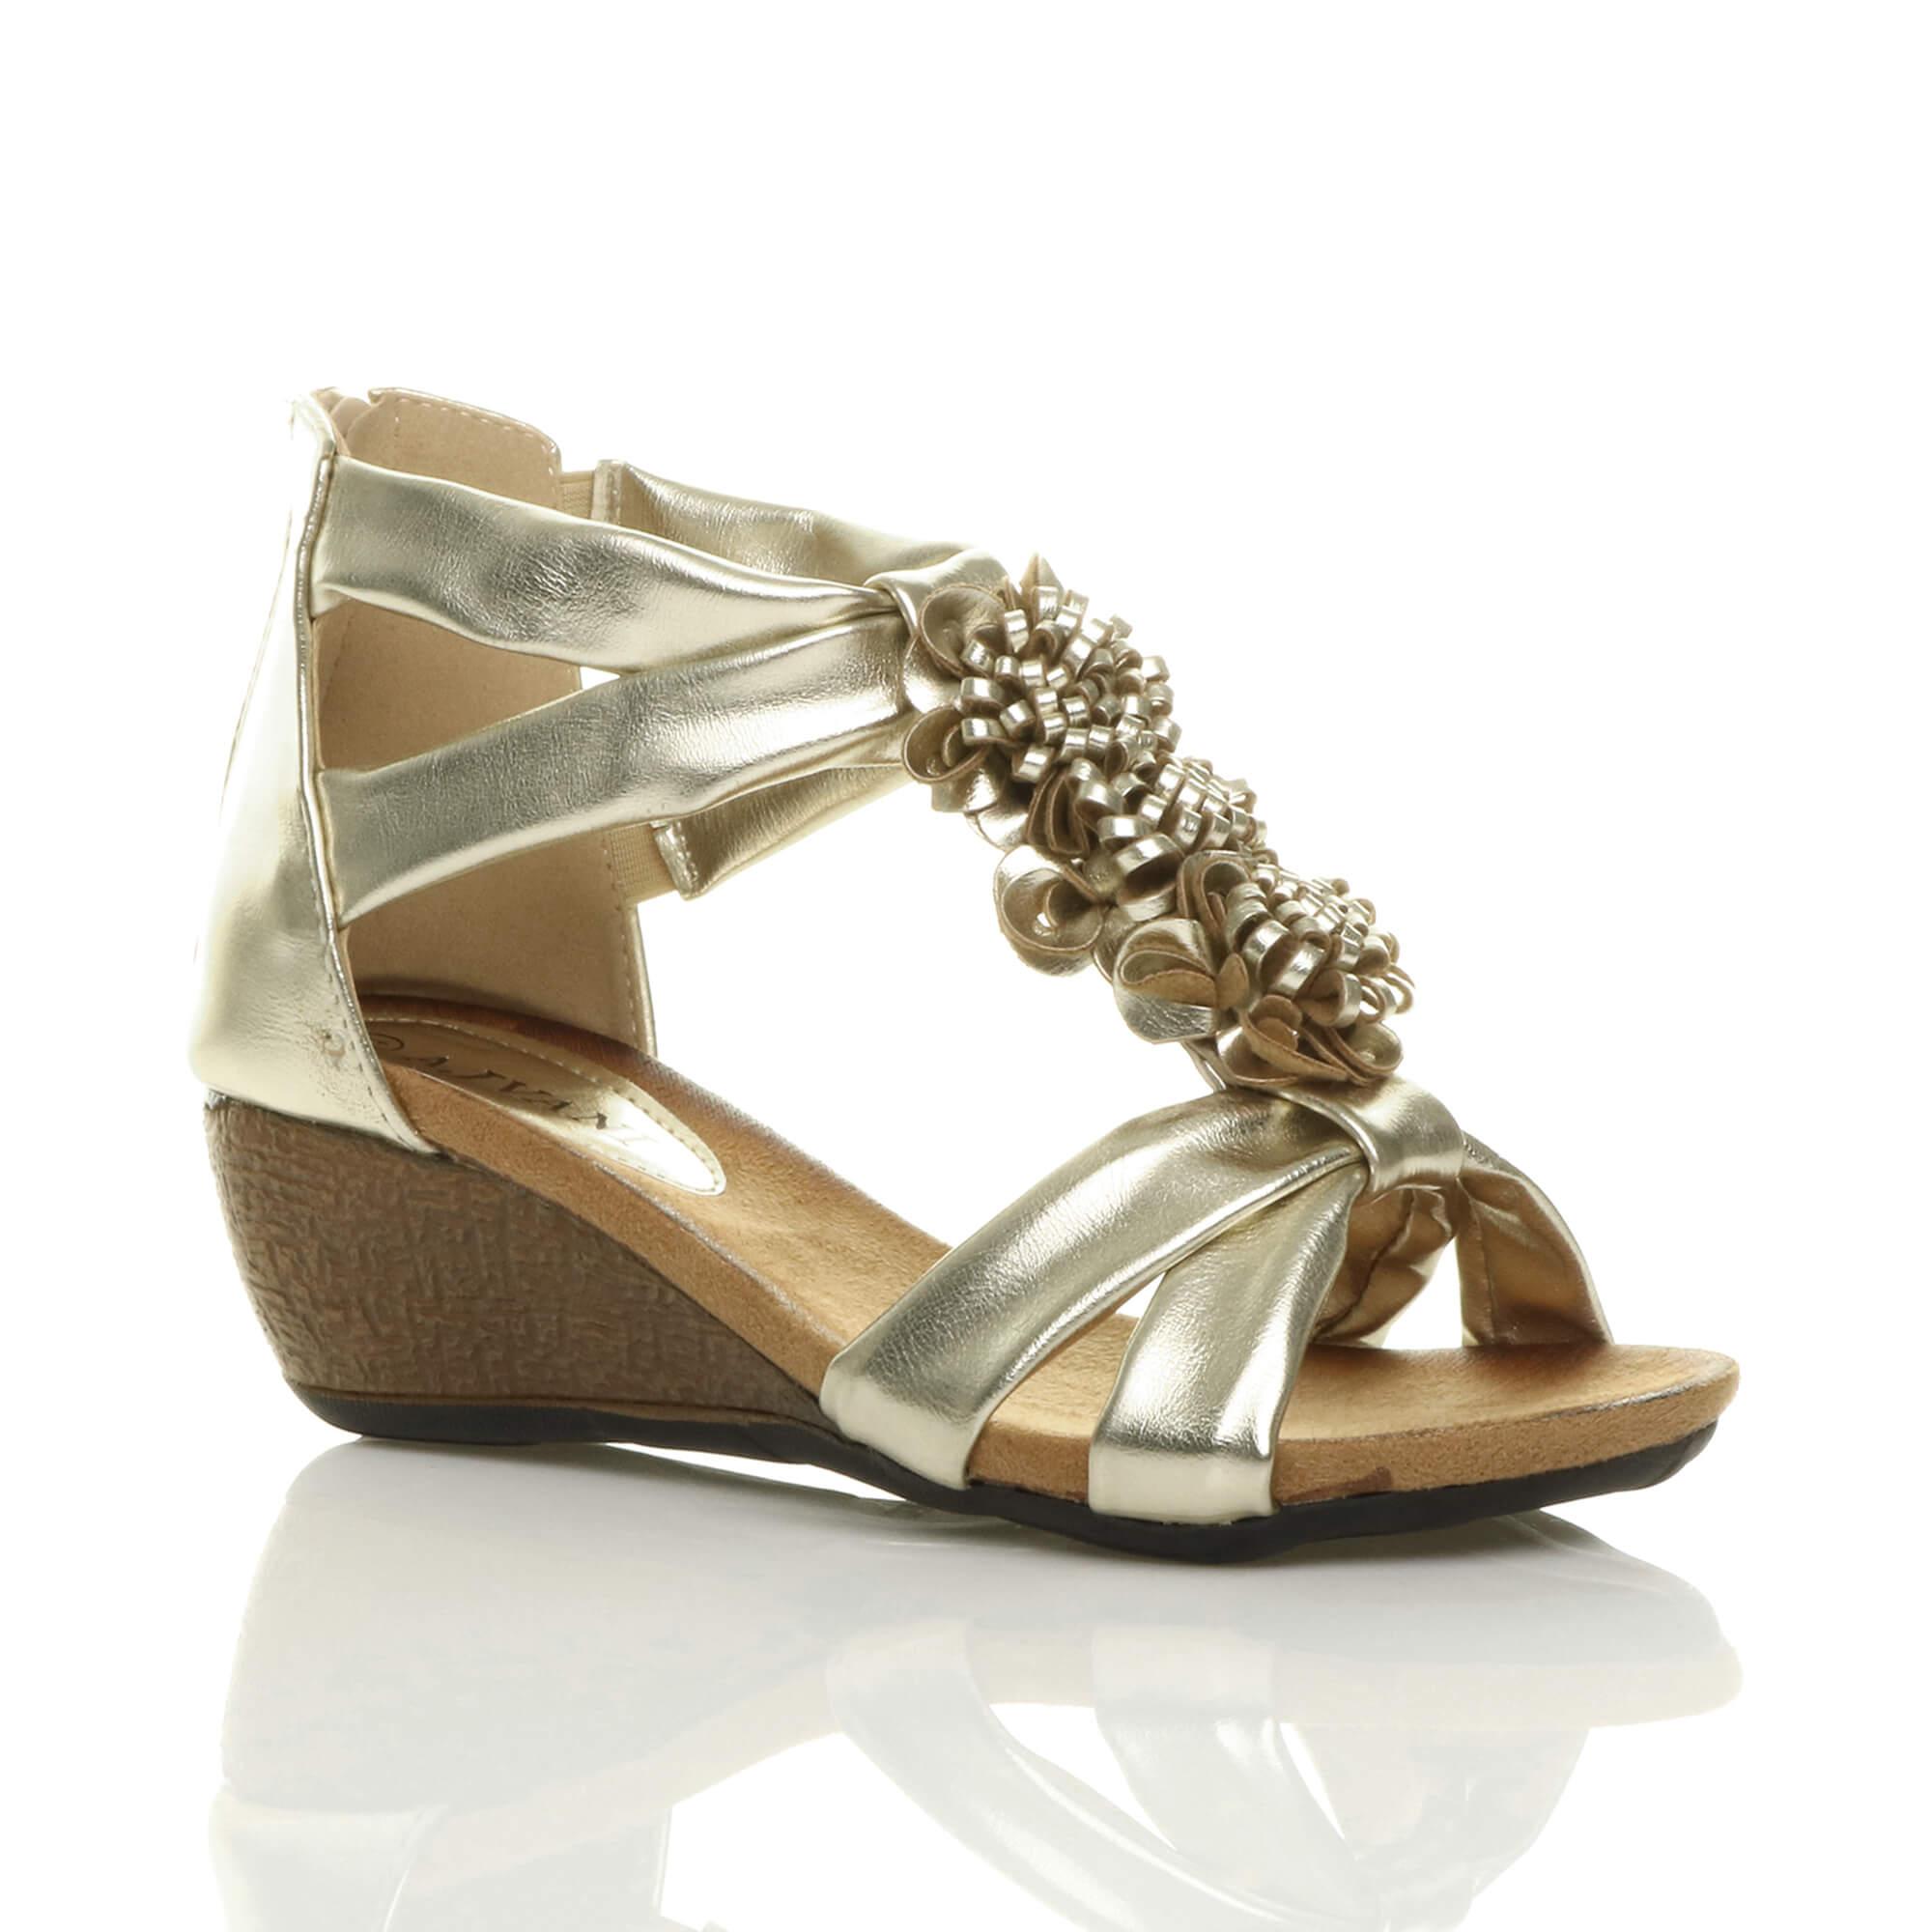 Damen Hohe Keilabsatz Peep Toe T-Riemen Blume Riemchensandalen Schuhe Größe 4 37 hupSB